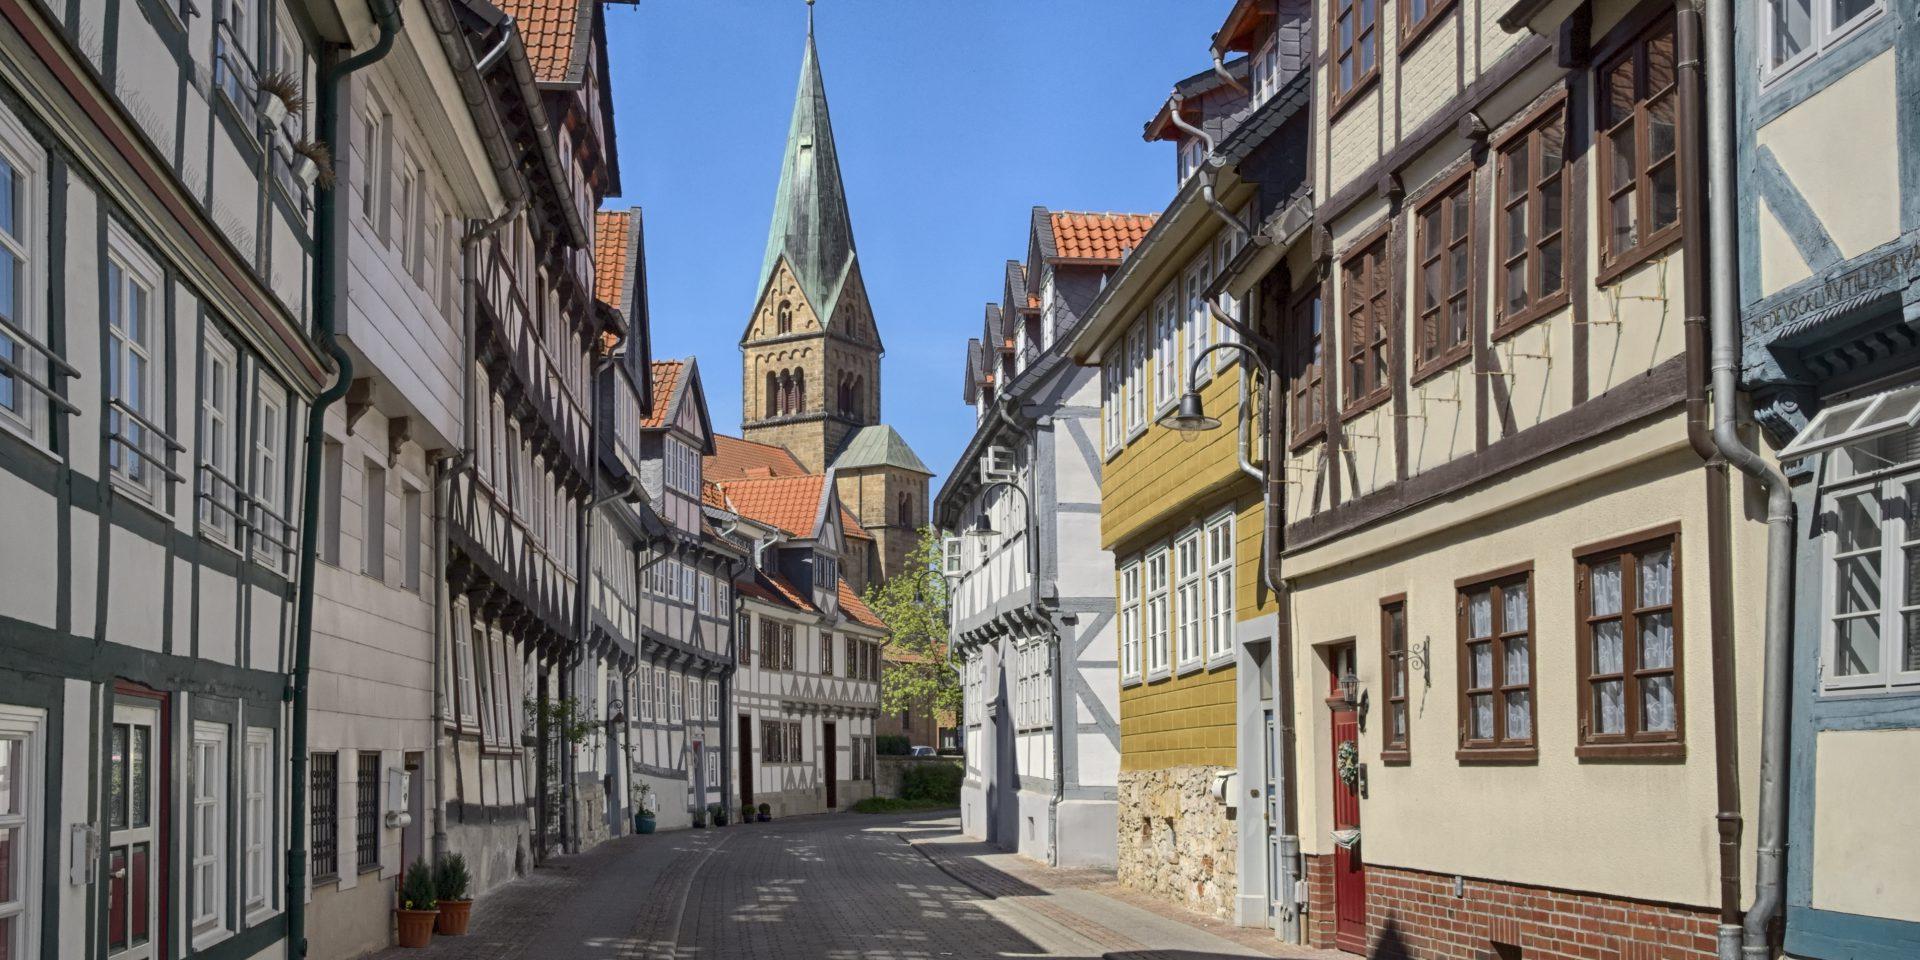 mobilet inWolfenbüttel